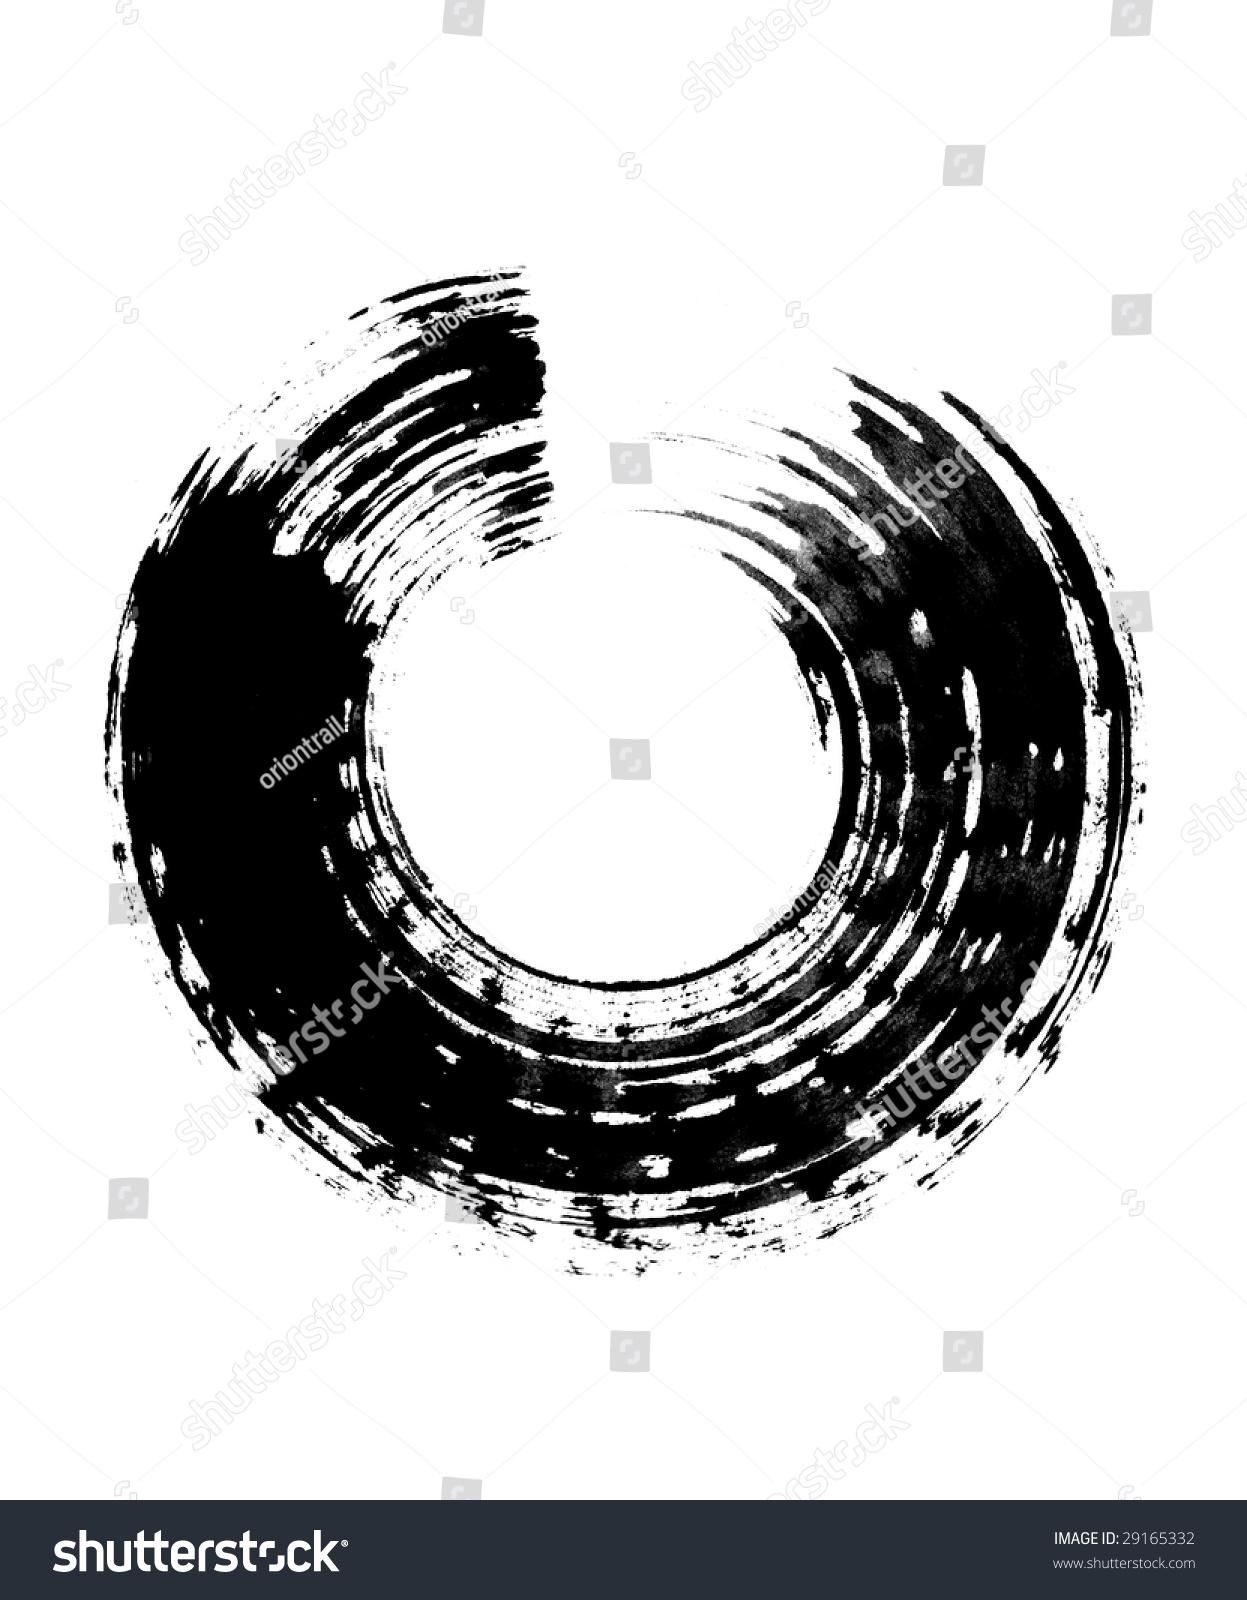 Japanese calligraphic brush stroke stock illustration